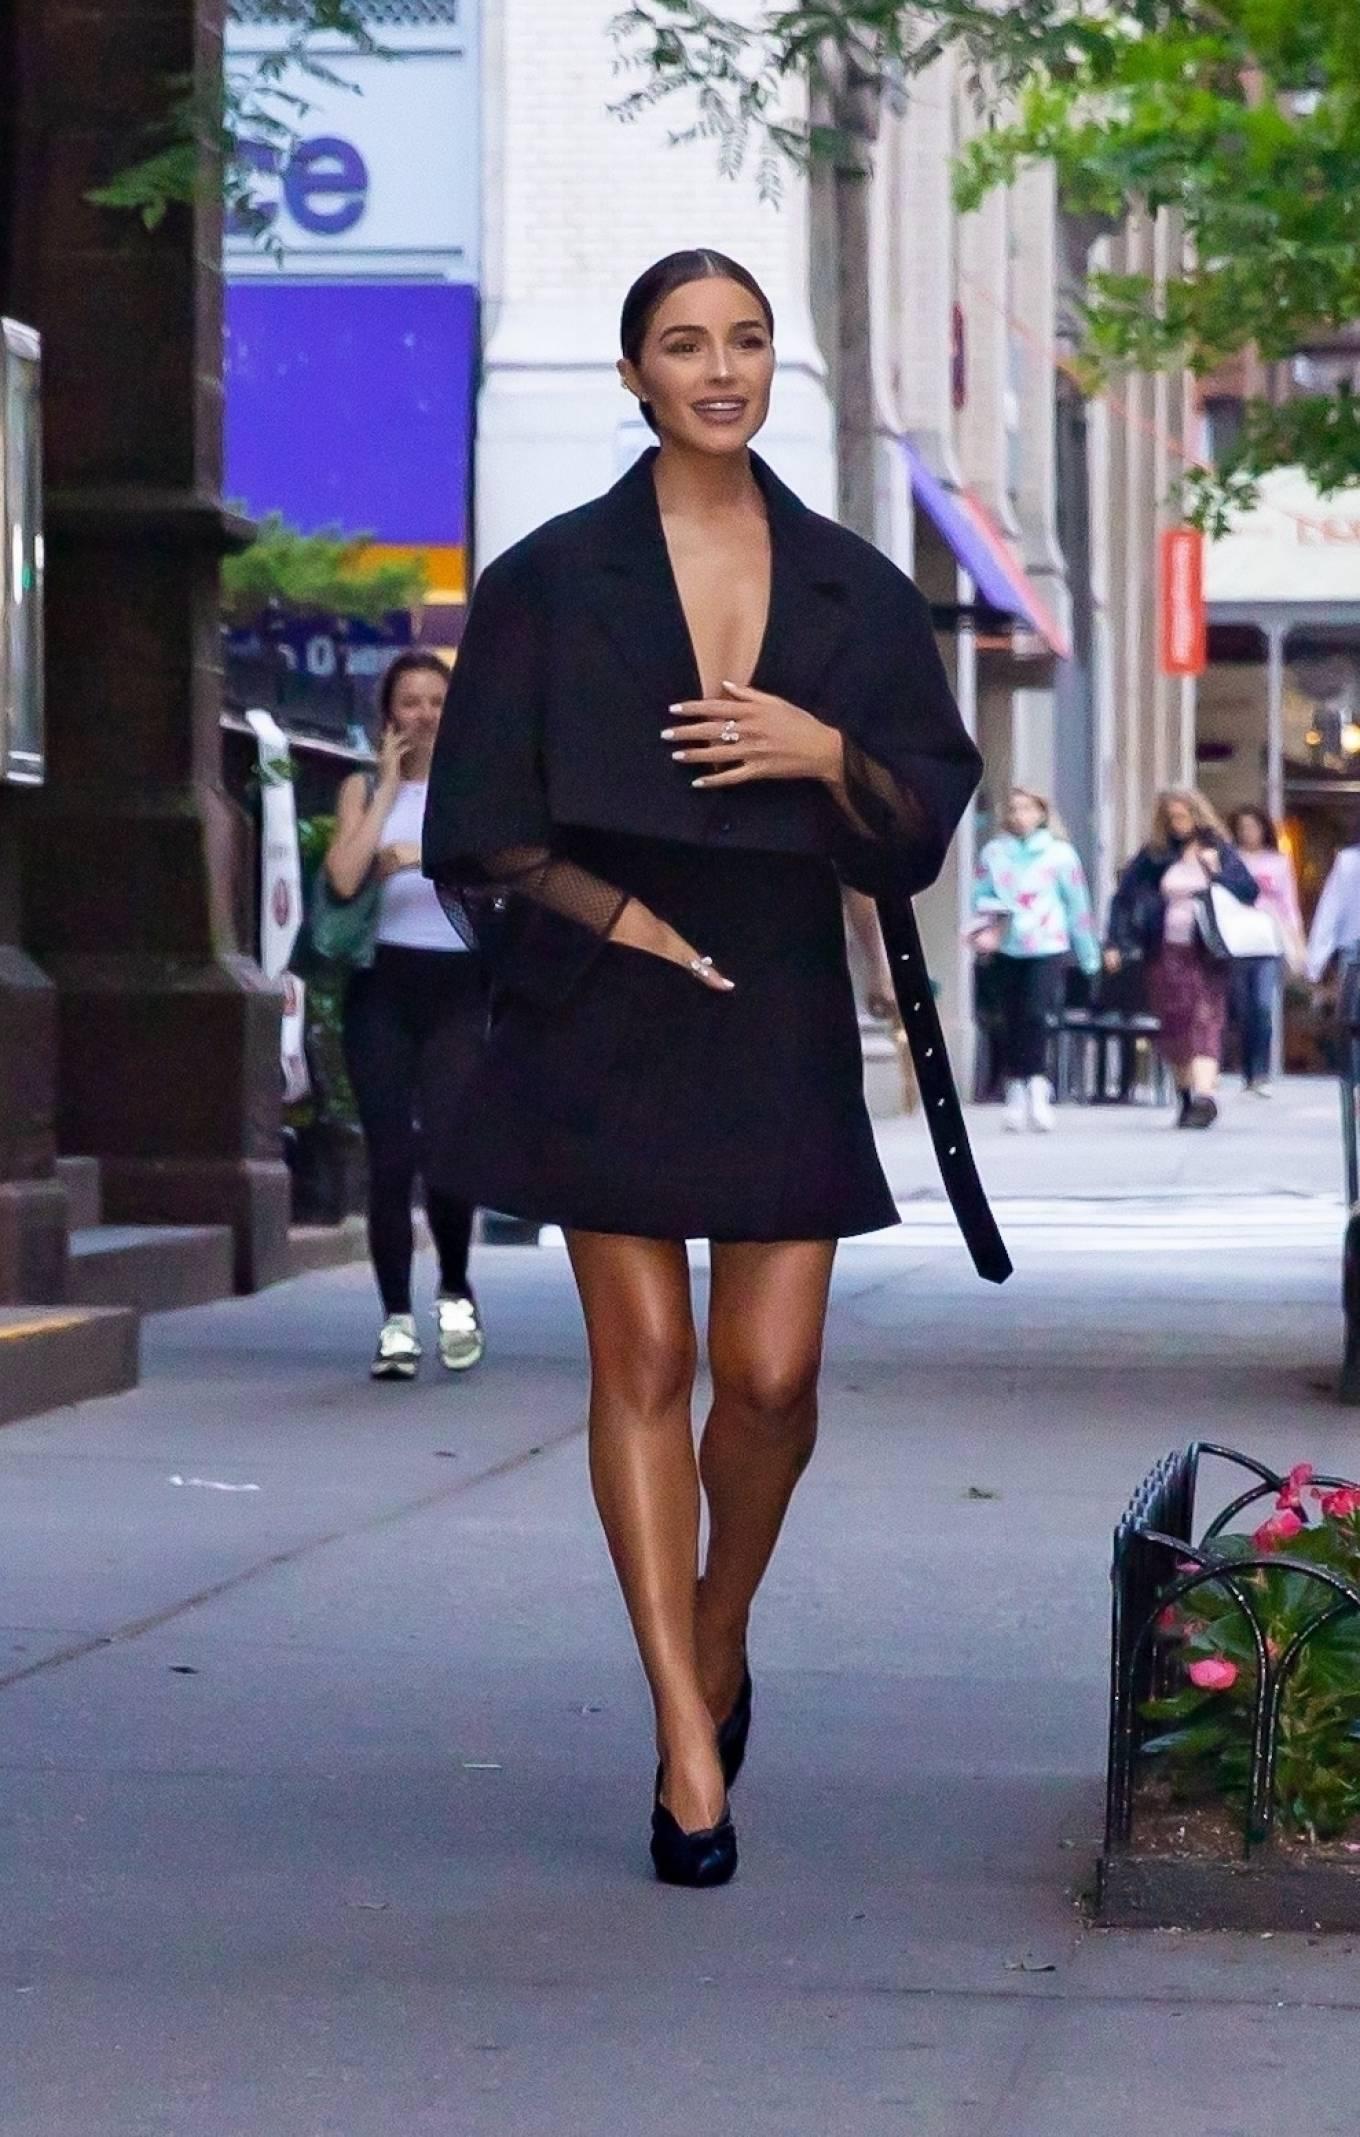 Olivia Culpo, black pumps, black Louis Vuitton crop jacket, pointed, slip on, stiletto heels, black wrap skirt. Olivia Culpo donning pointed black slip on pumps with stiletto heels and twisted front detailing